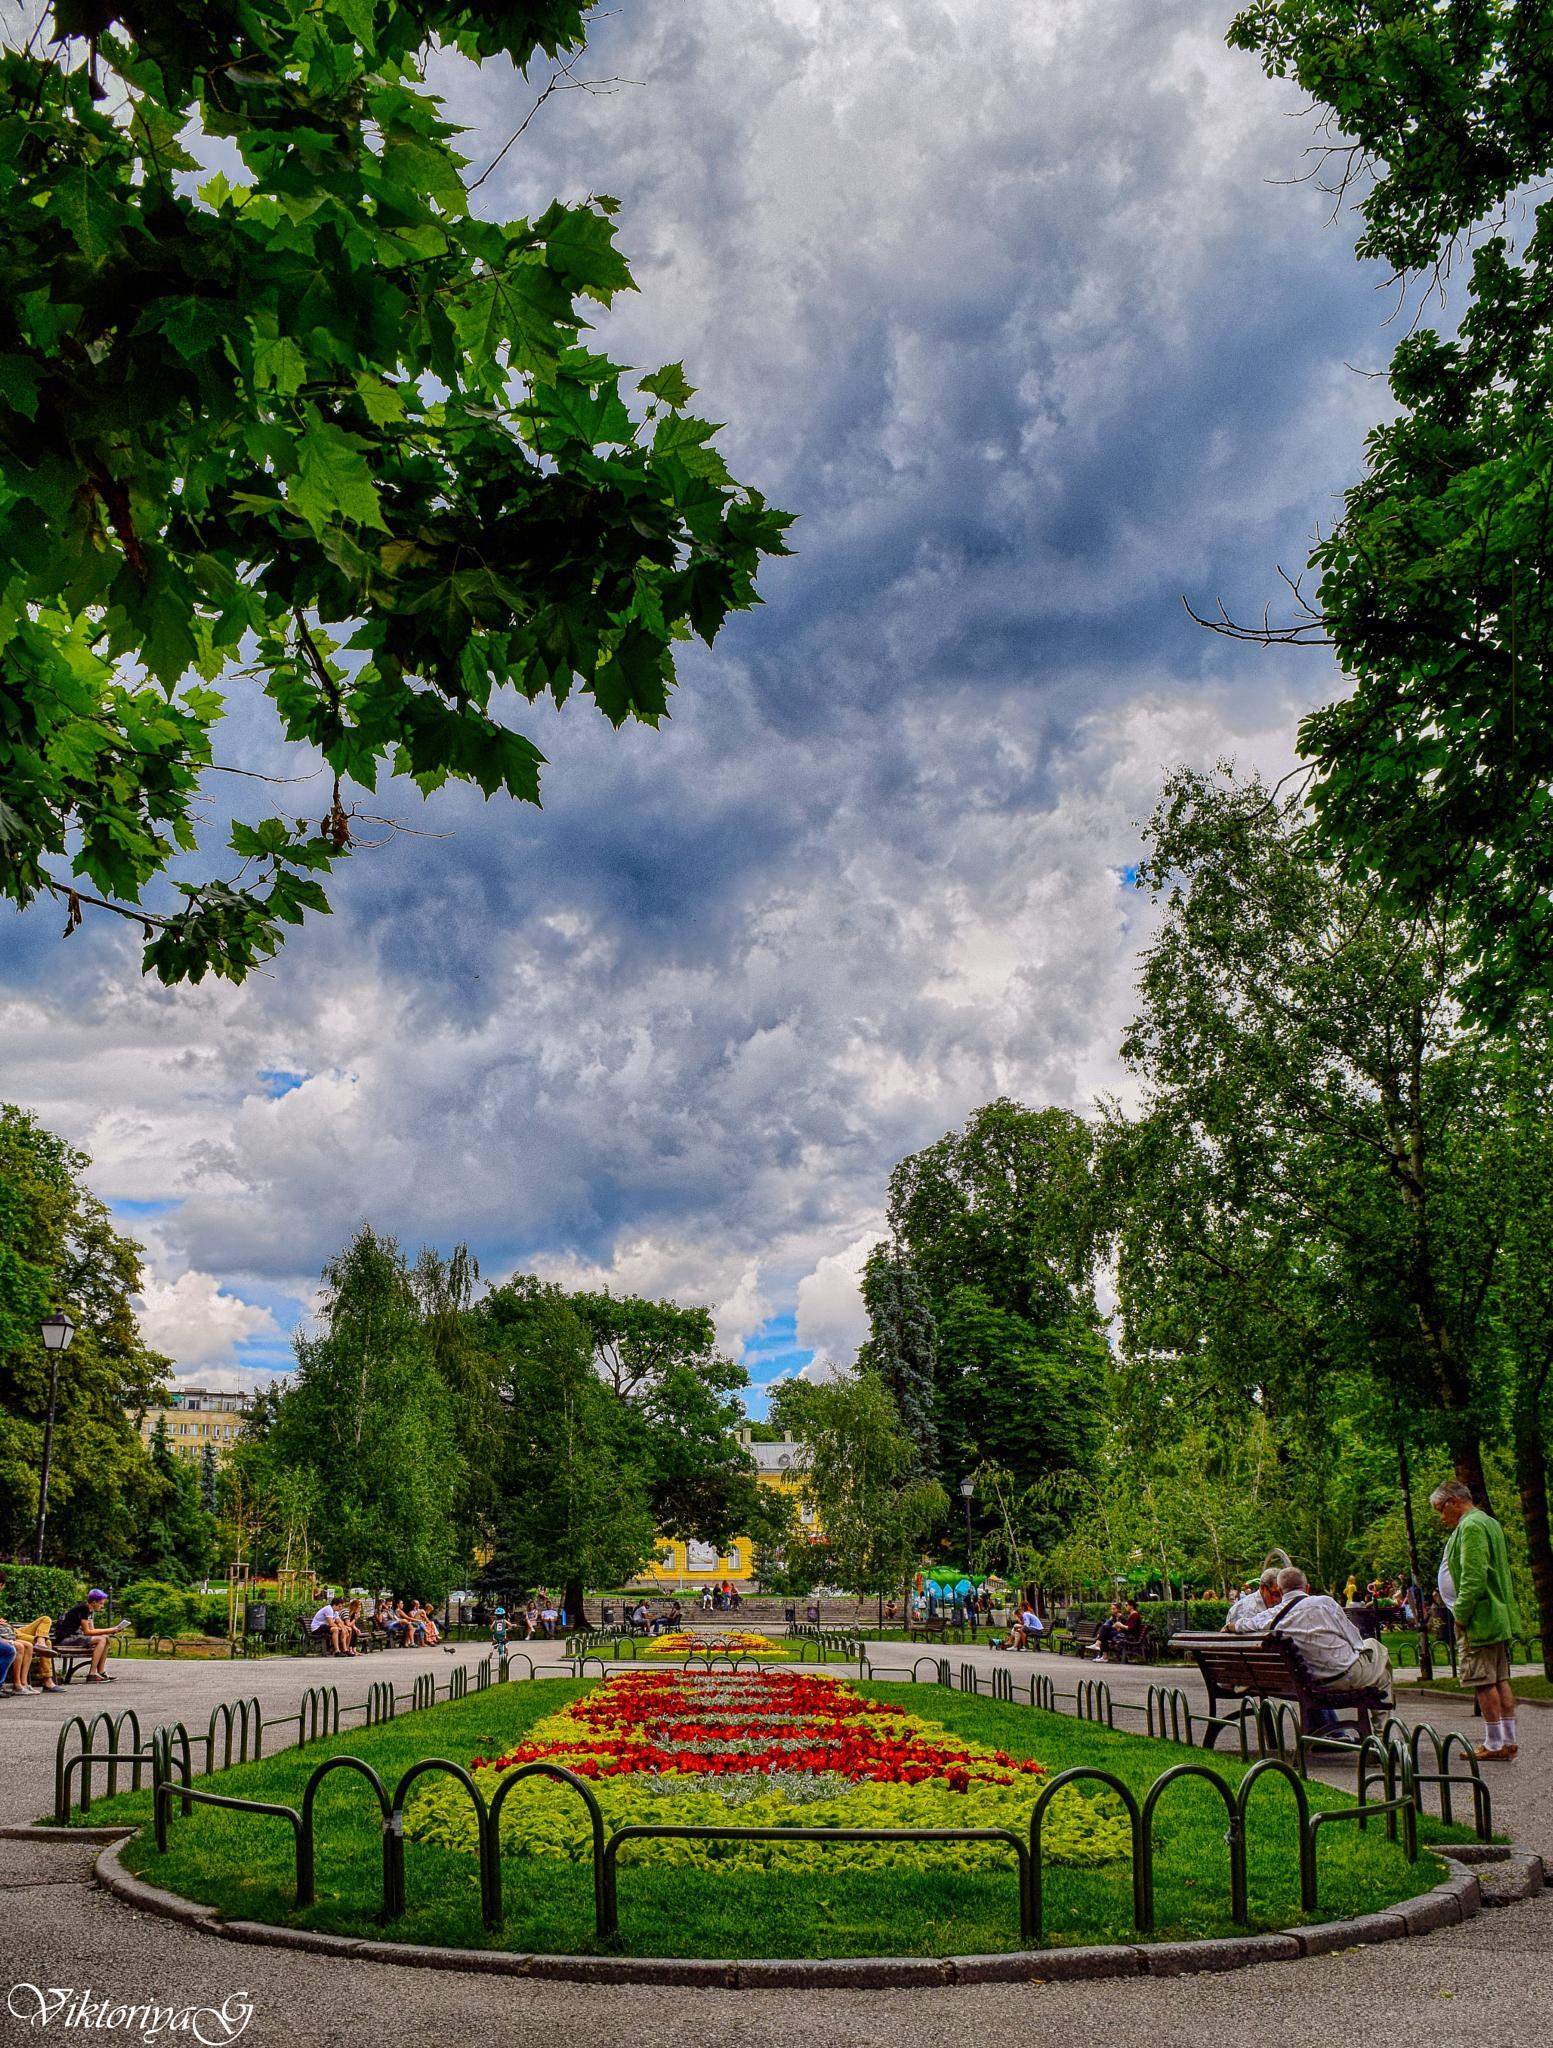 HDR garden by Viktoriya Georgieva